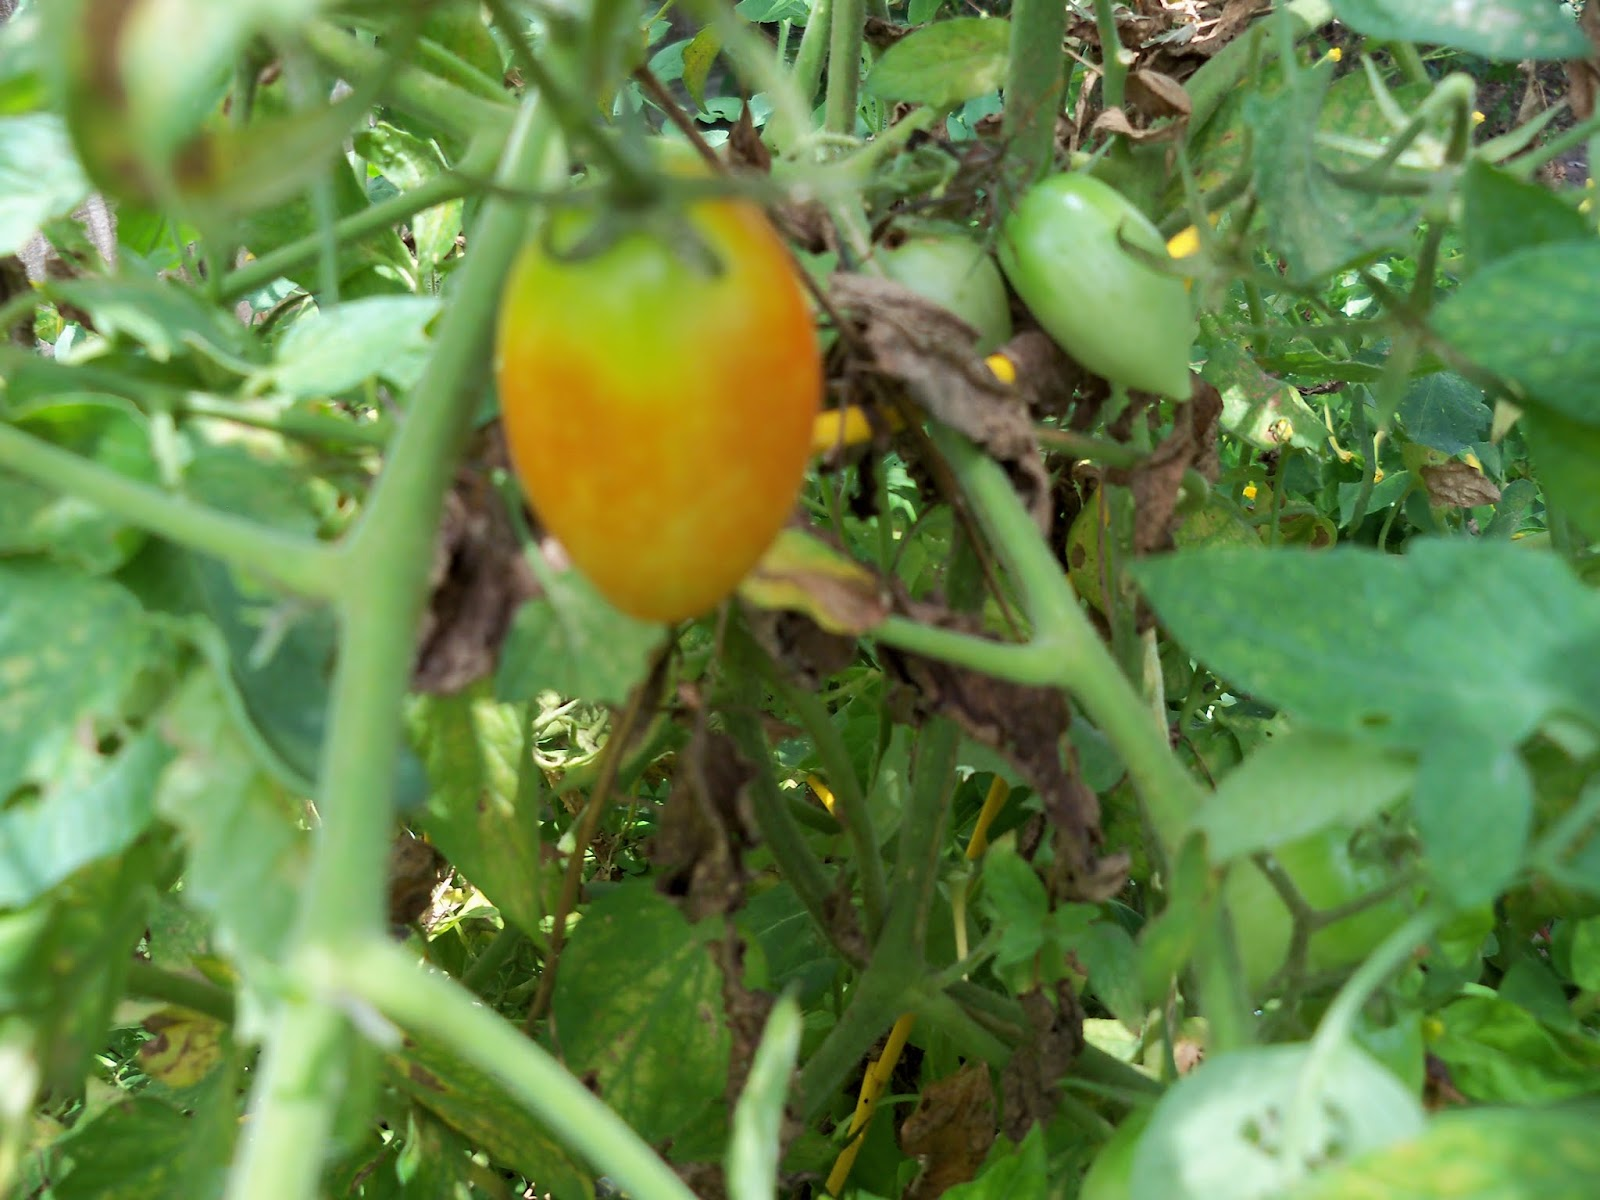 Gardening 2015 - 116_9407.JPG